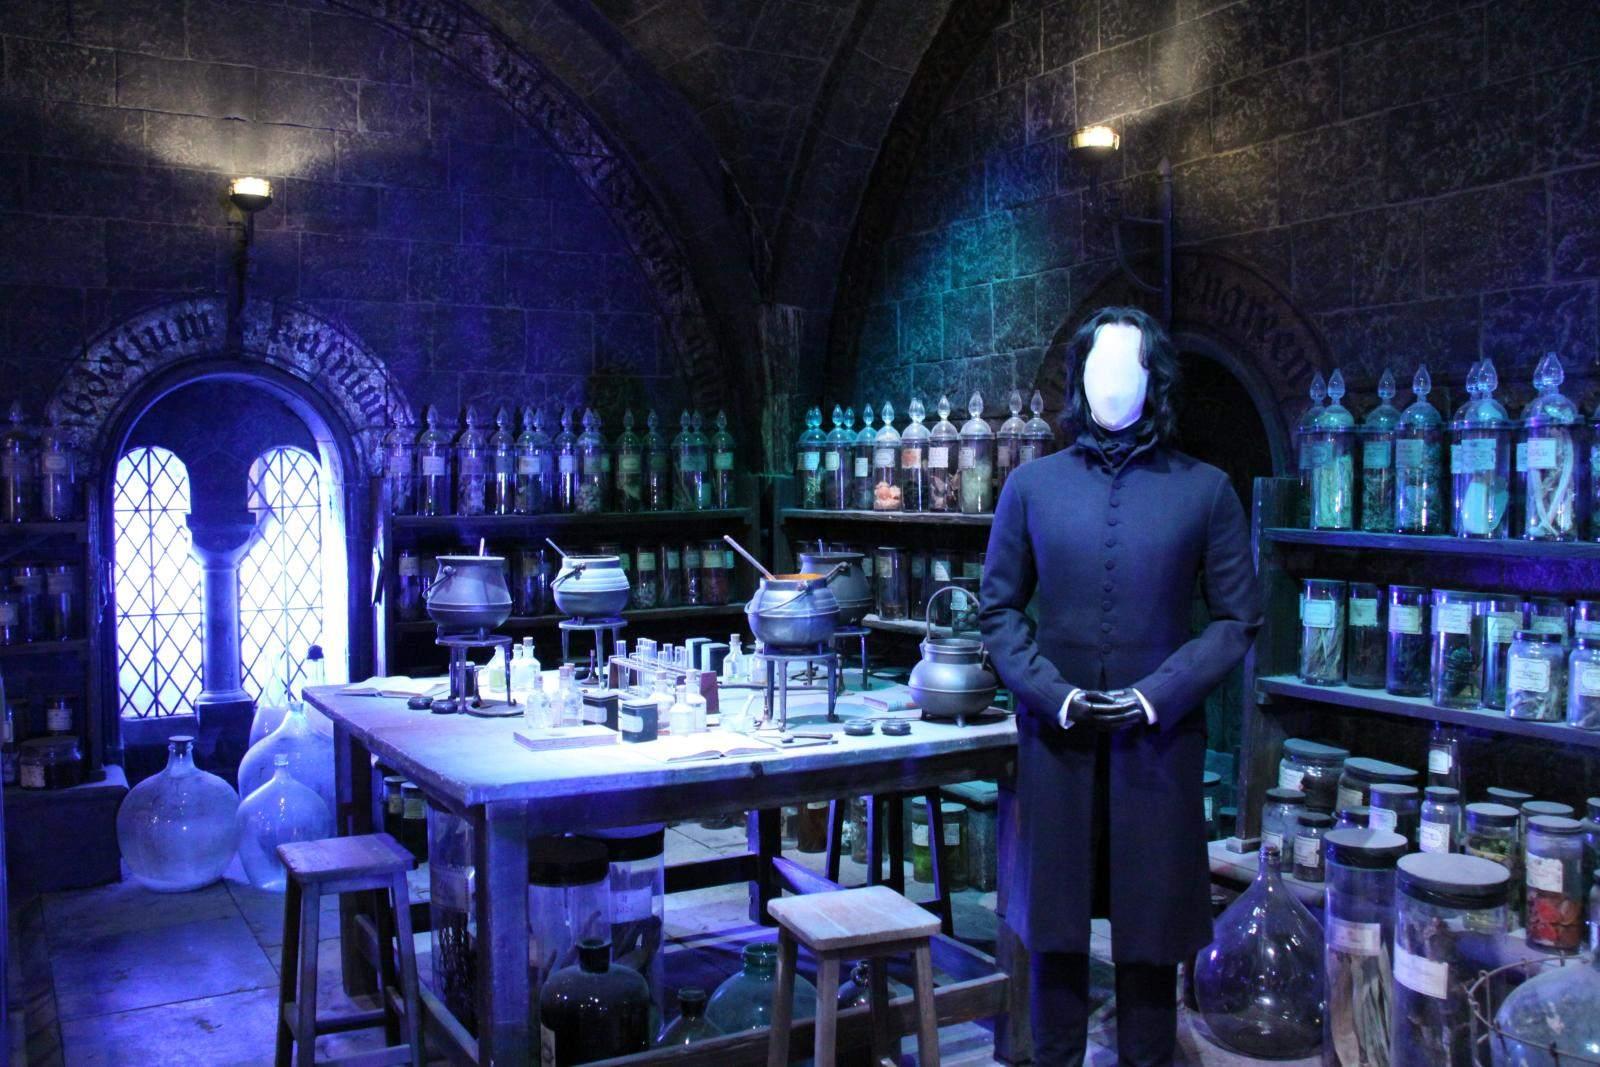 making harry potter9 The Making of Harry Potter, Warner Bros Studio London